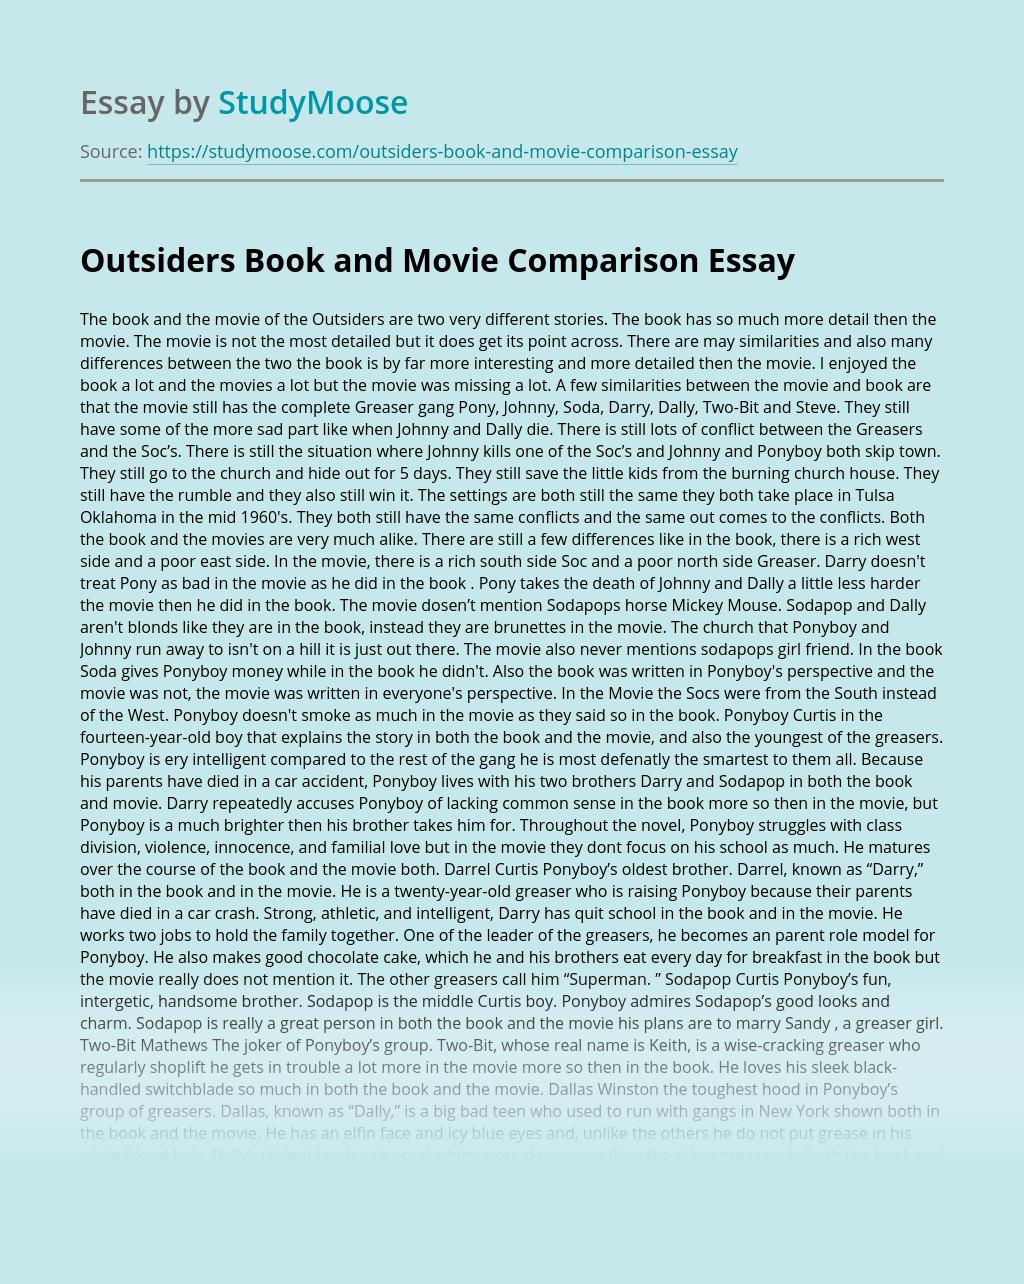 Outsiders Book and Movie Comparison